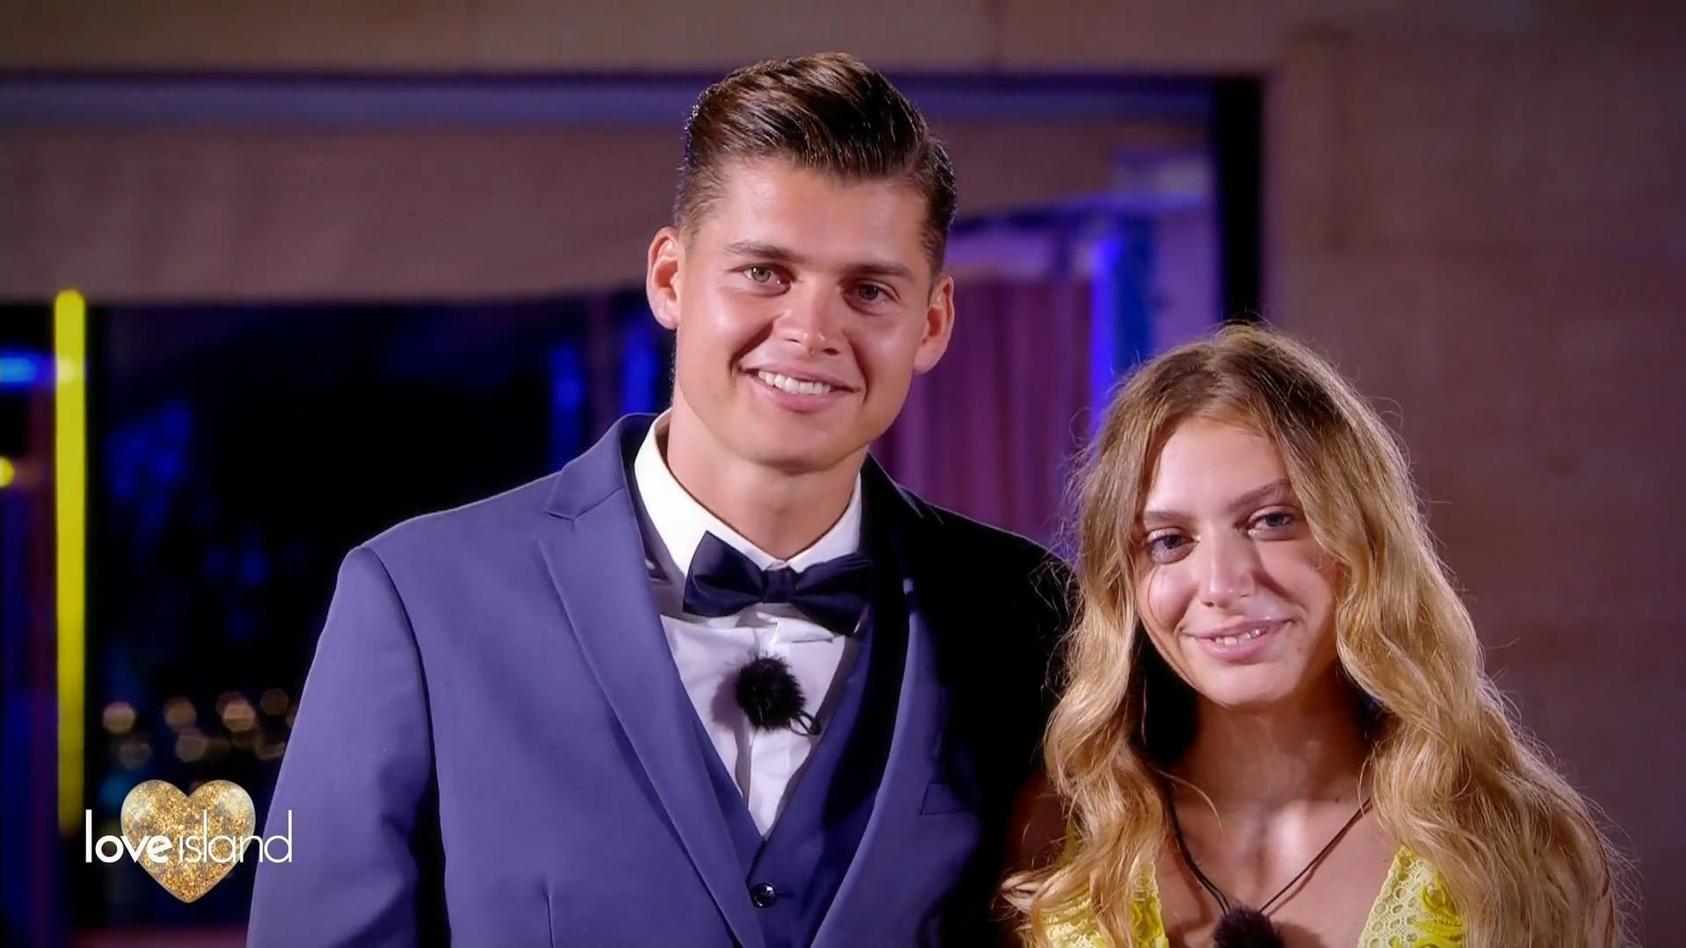 sieger-couple-steht-fest-robin-isabell-gewinnen-love-island